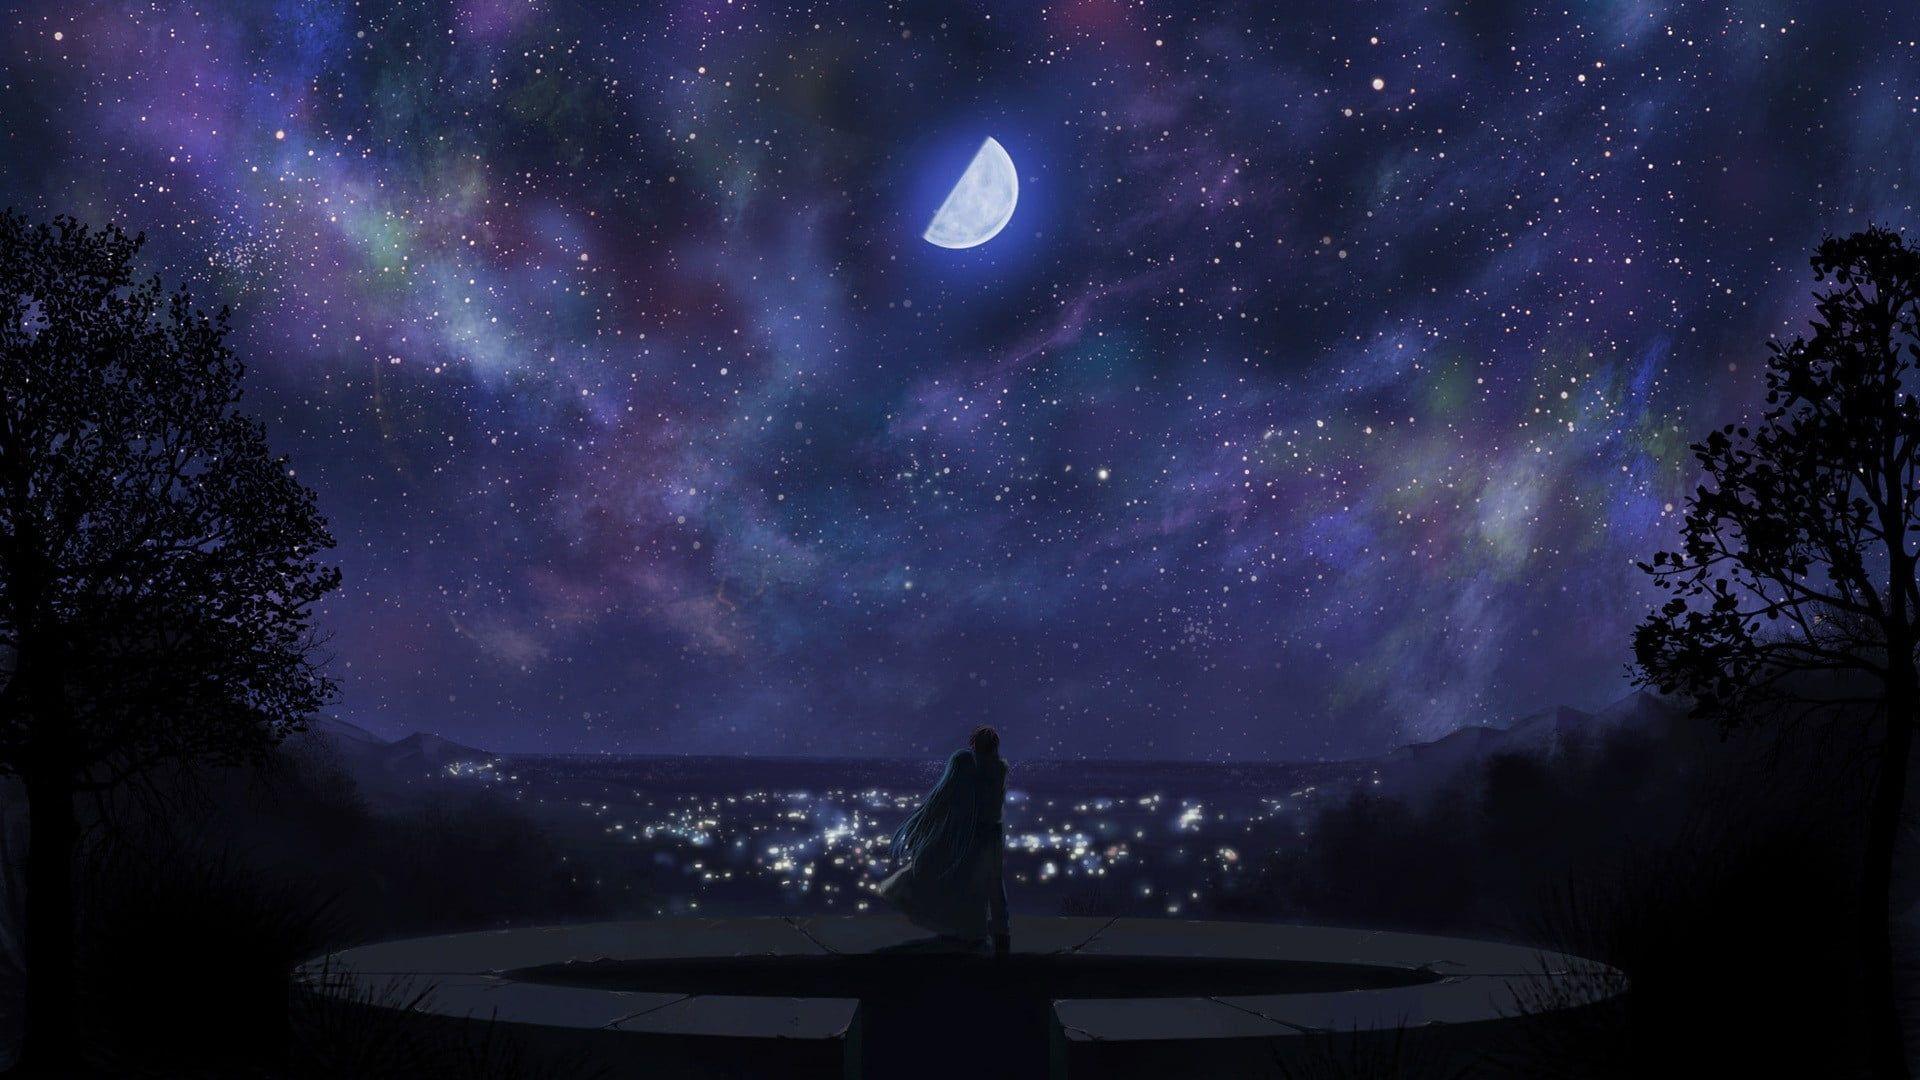 White Cape Anime Sky Moon Clouds City 1080p Wallpaper Hdwallpaper Desktop Anime Background Night Sky Wallpaper Ribbon In The Sky